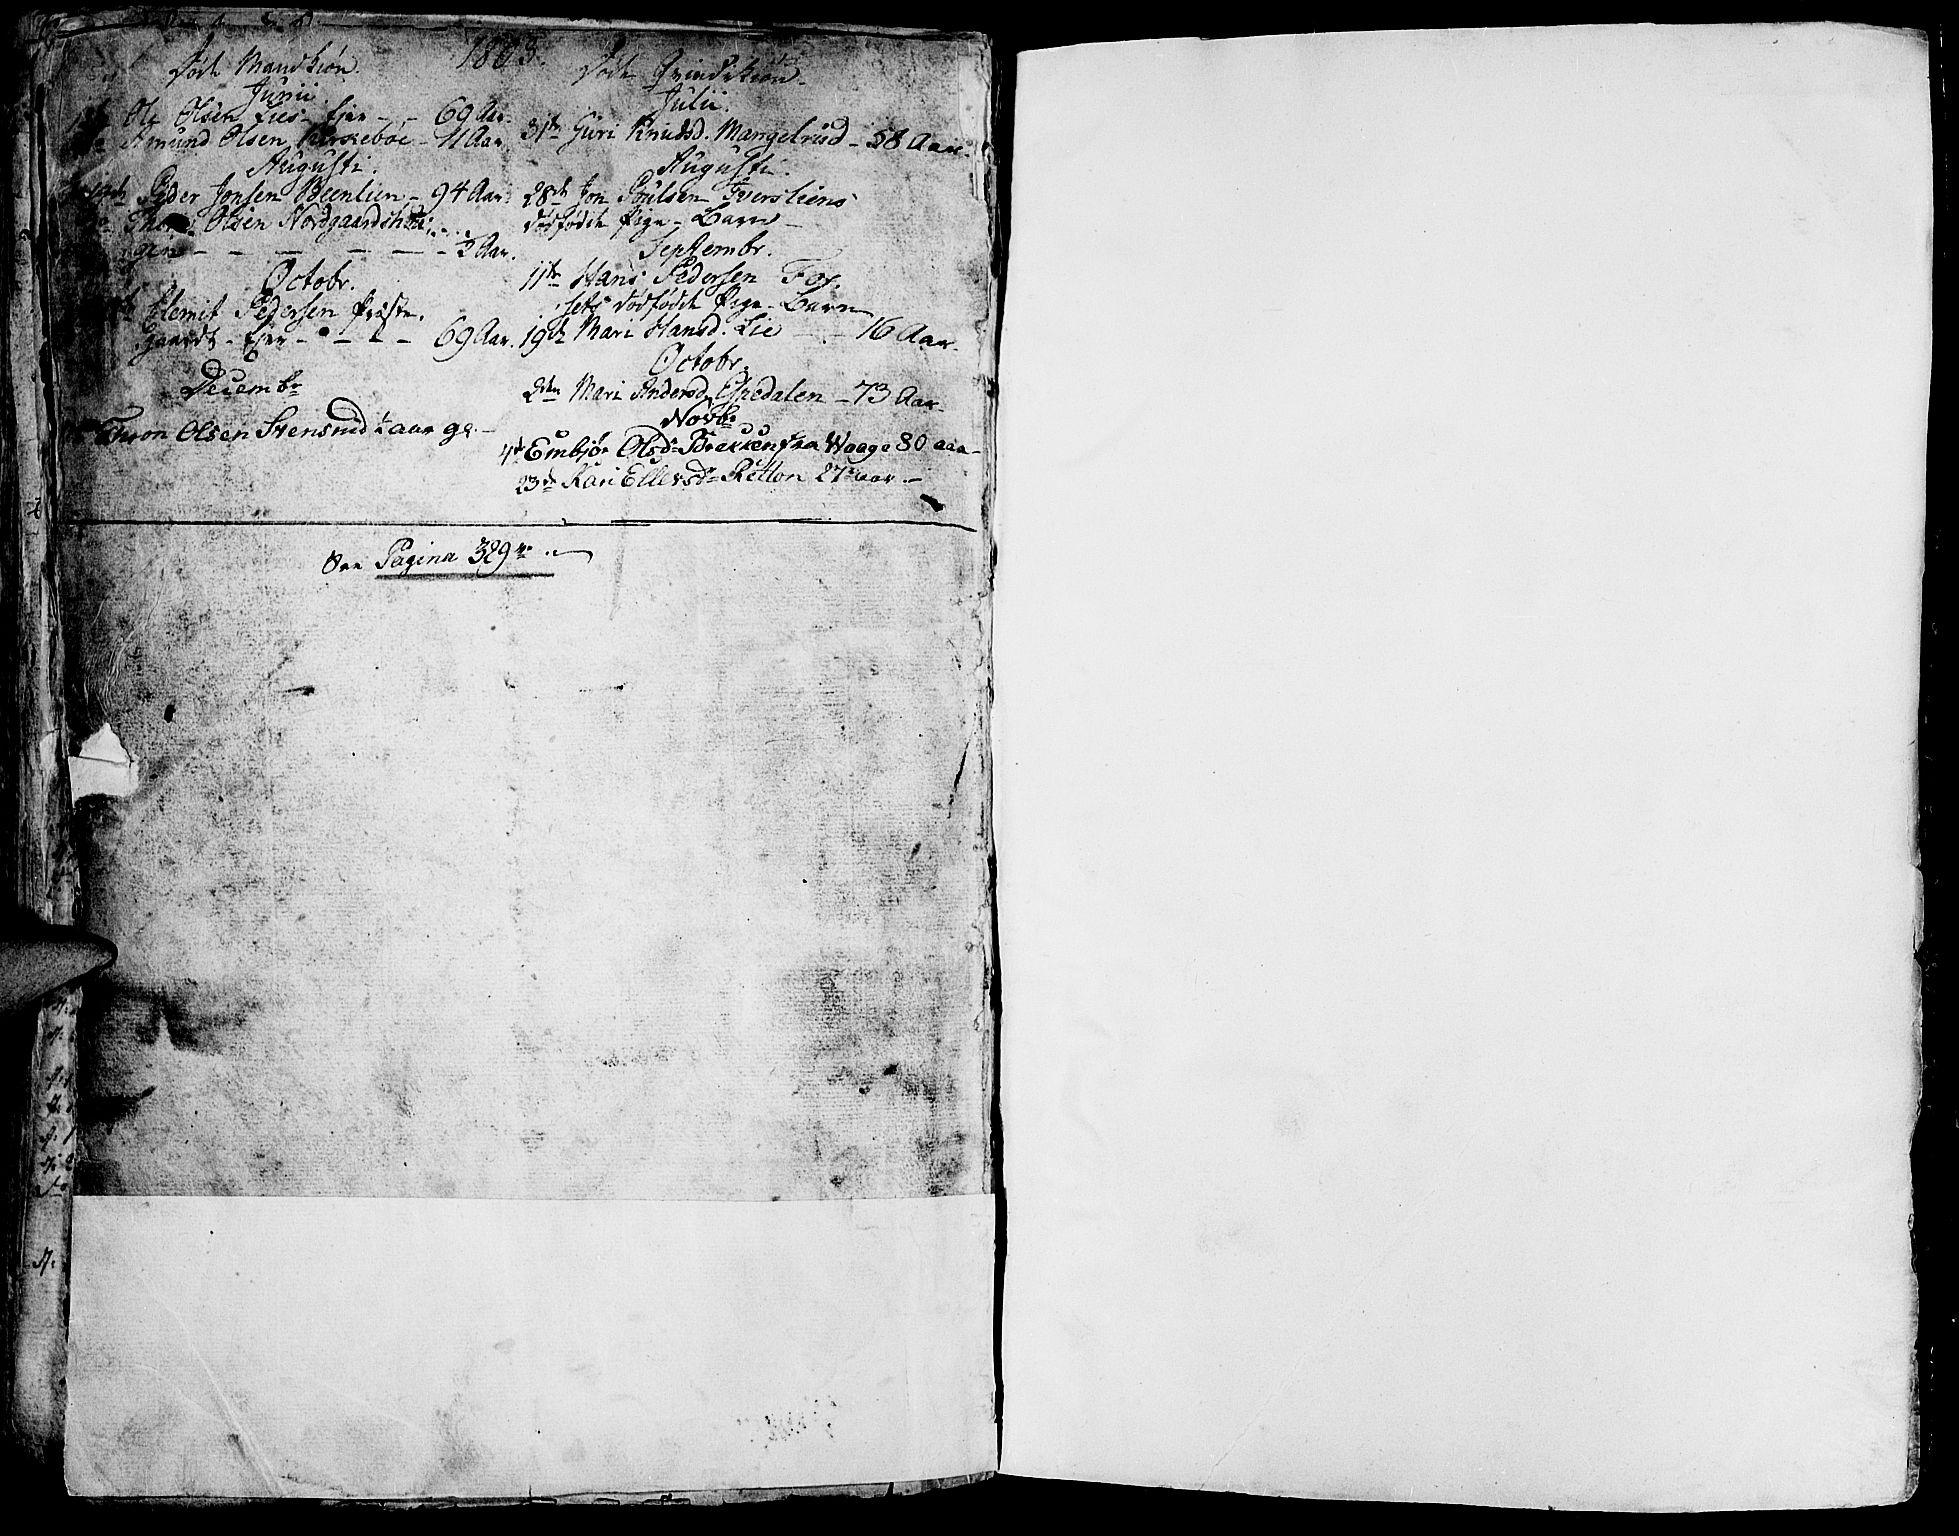 SAH, Gausdal prestekontor, Ministerialbok nr. 3, 1758-1809, s. 361